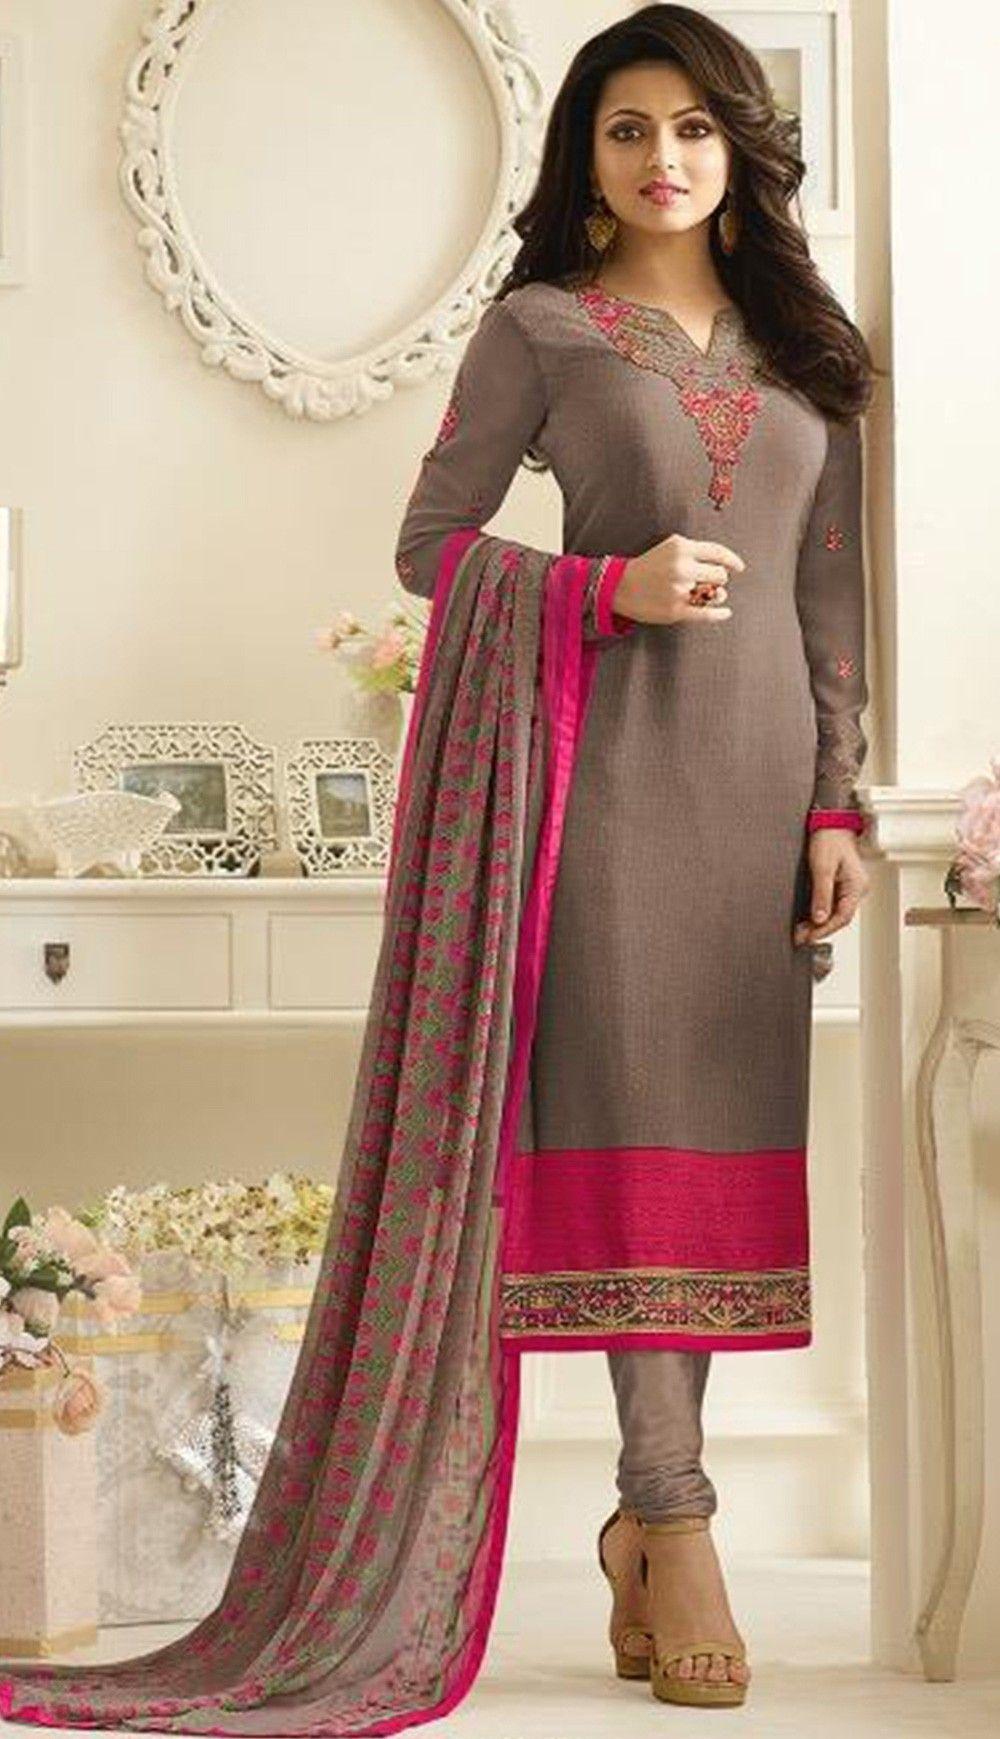 0a0b82d7a3 Latest Salwar Kameez Designs 2018 For Indian Pakistani Girls ...